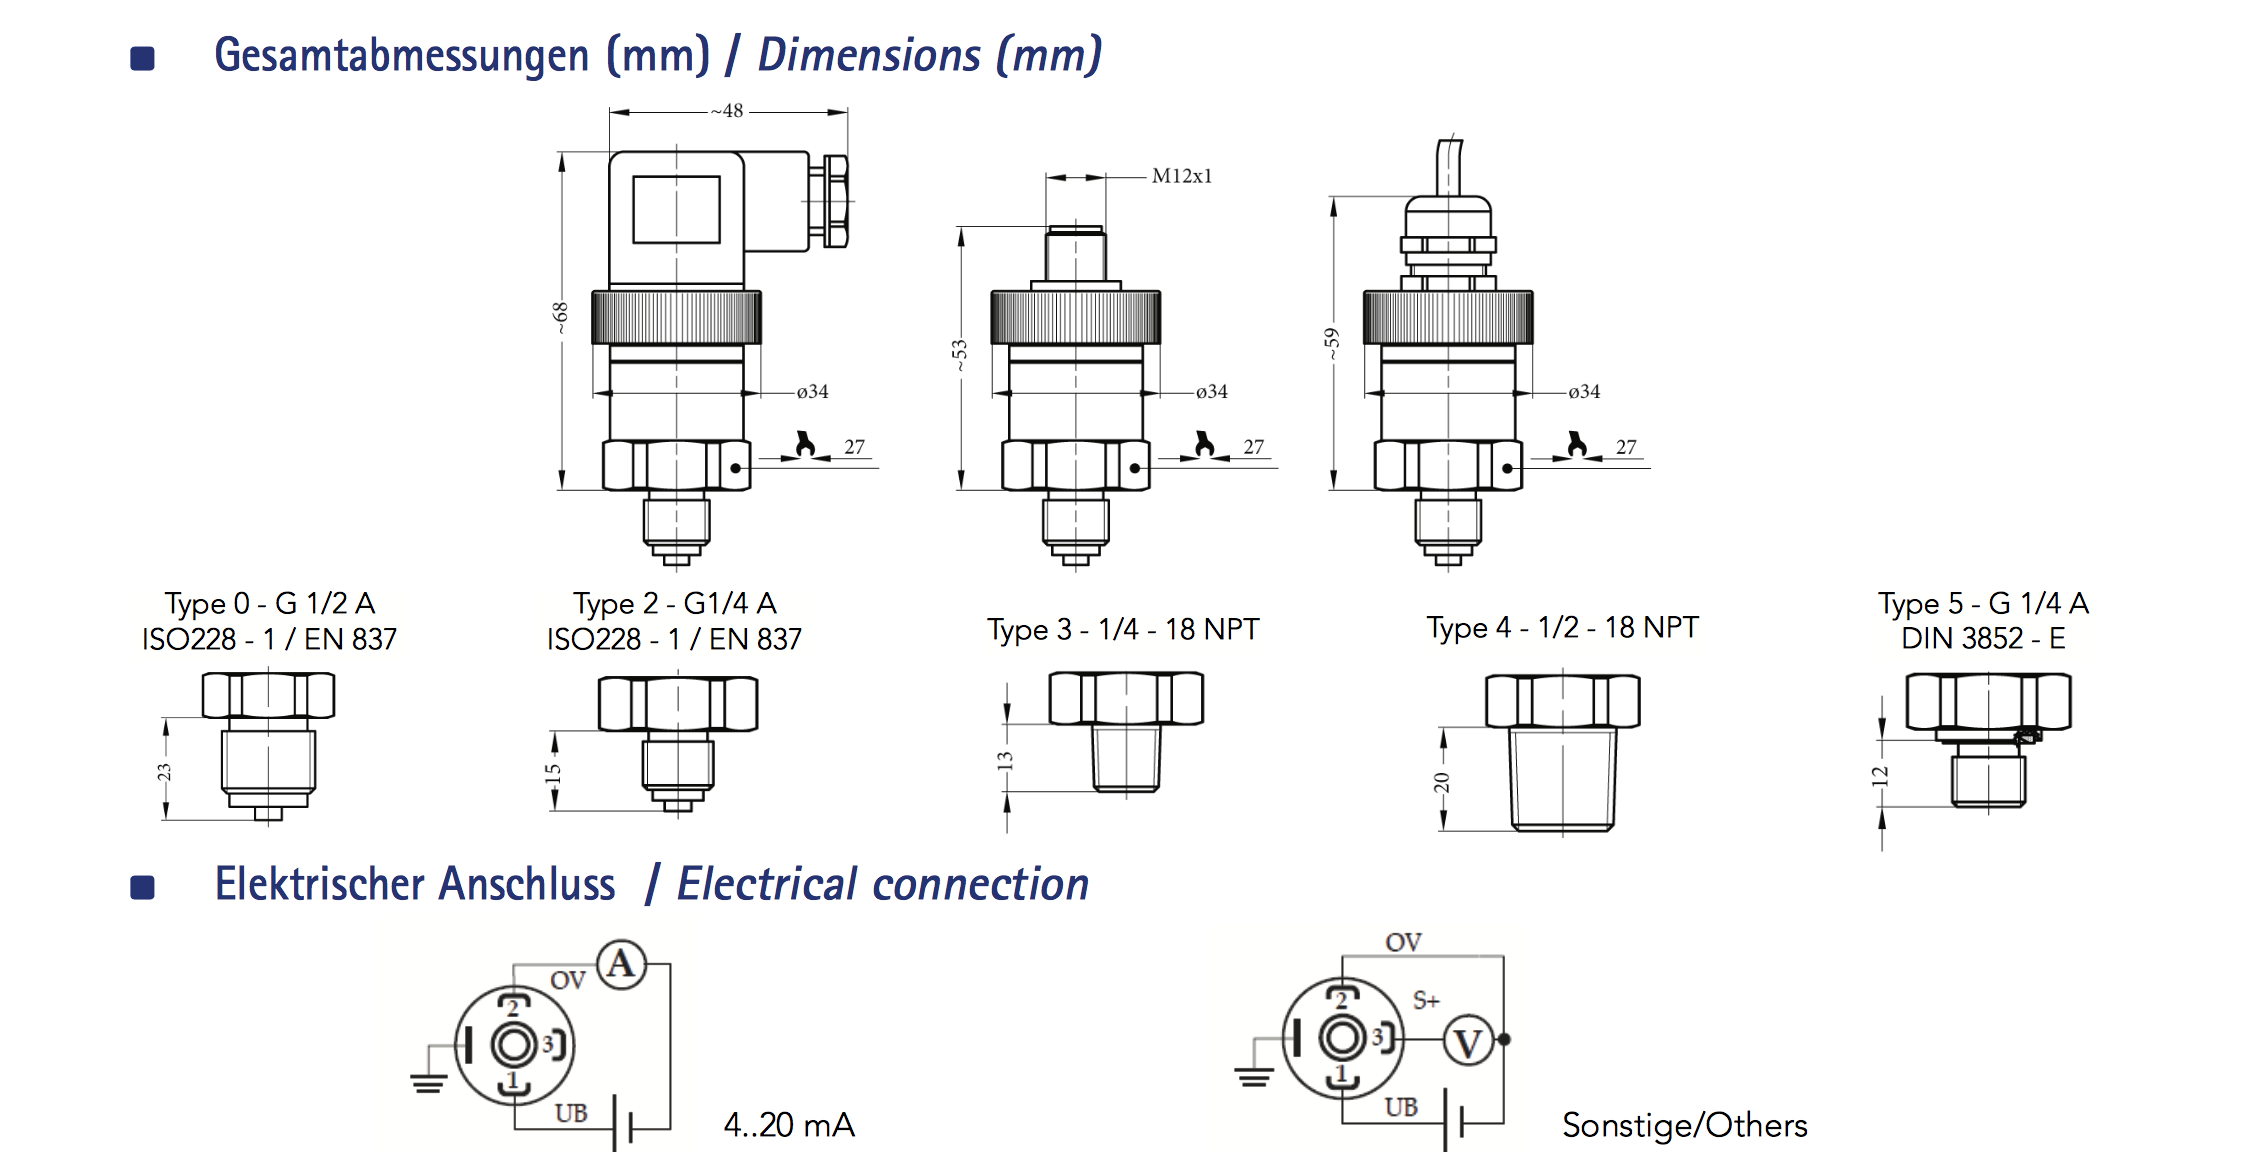 Kiểu kết nối của cảm biến áp suất